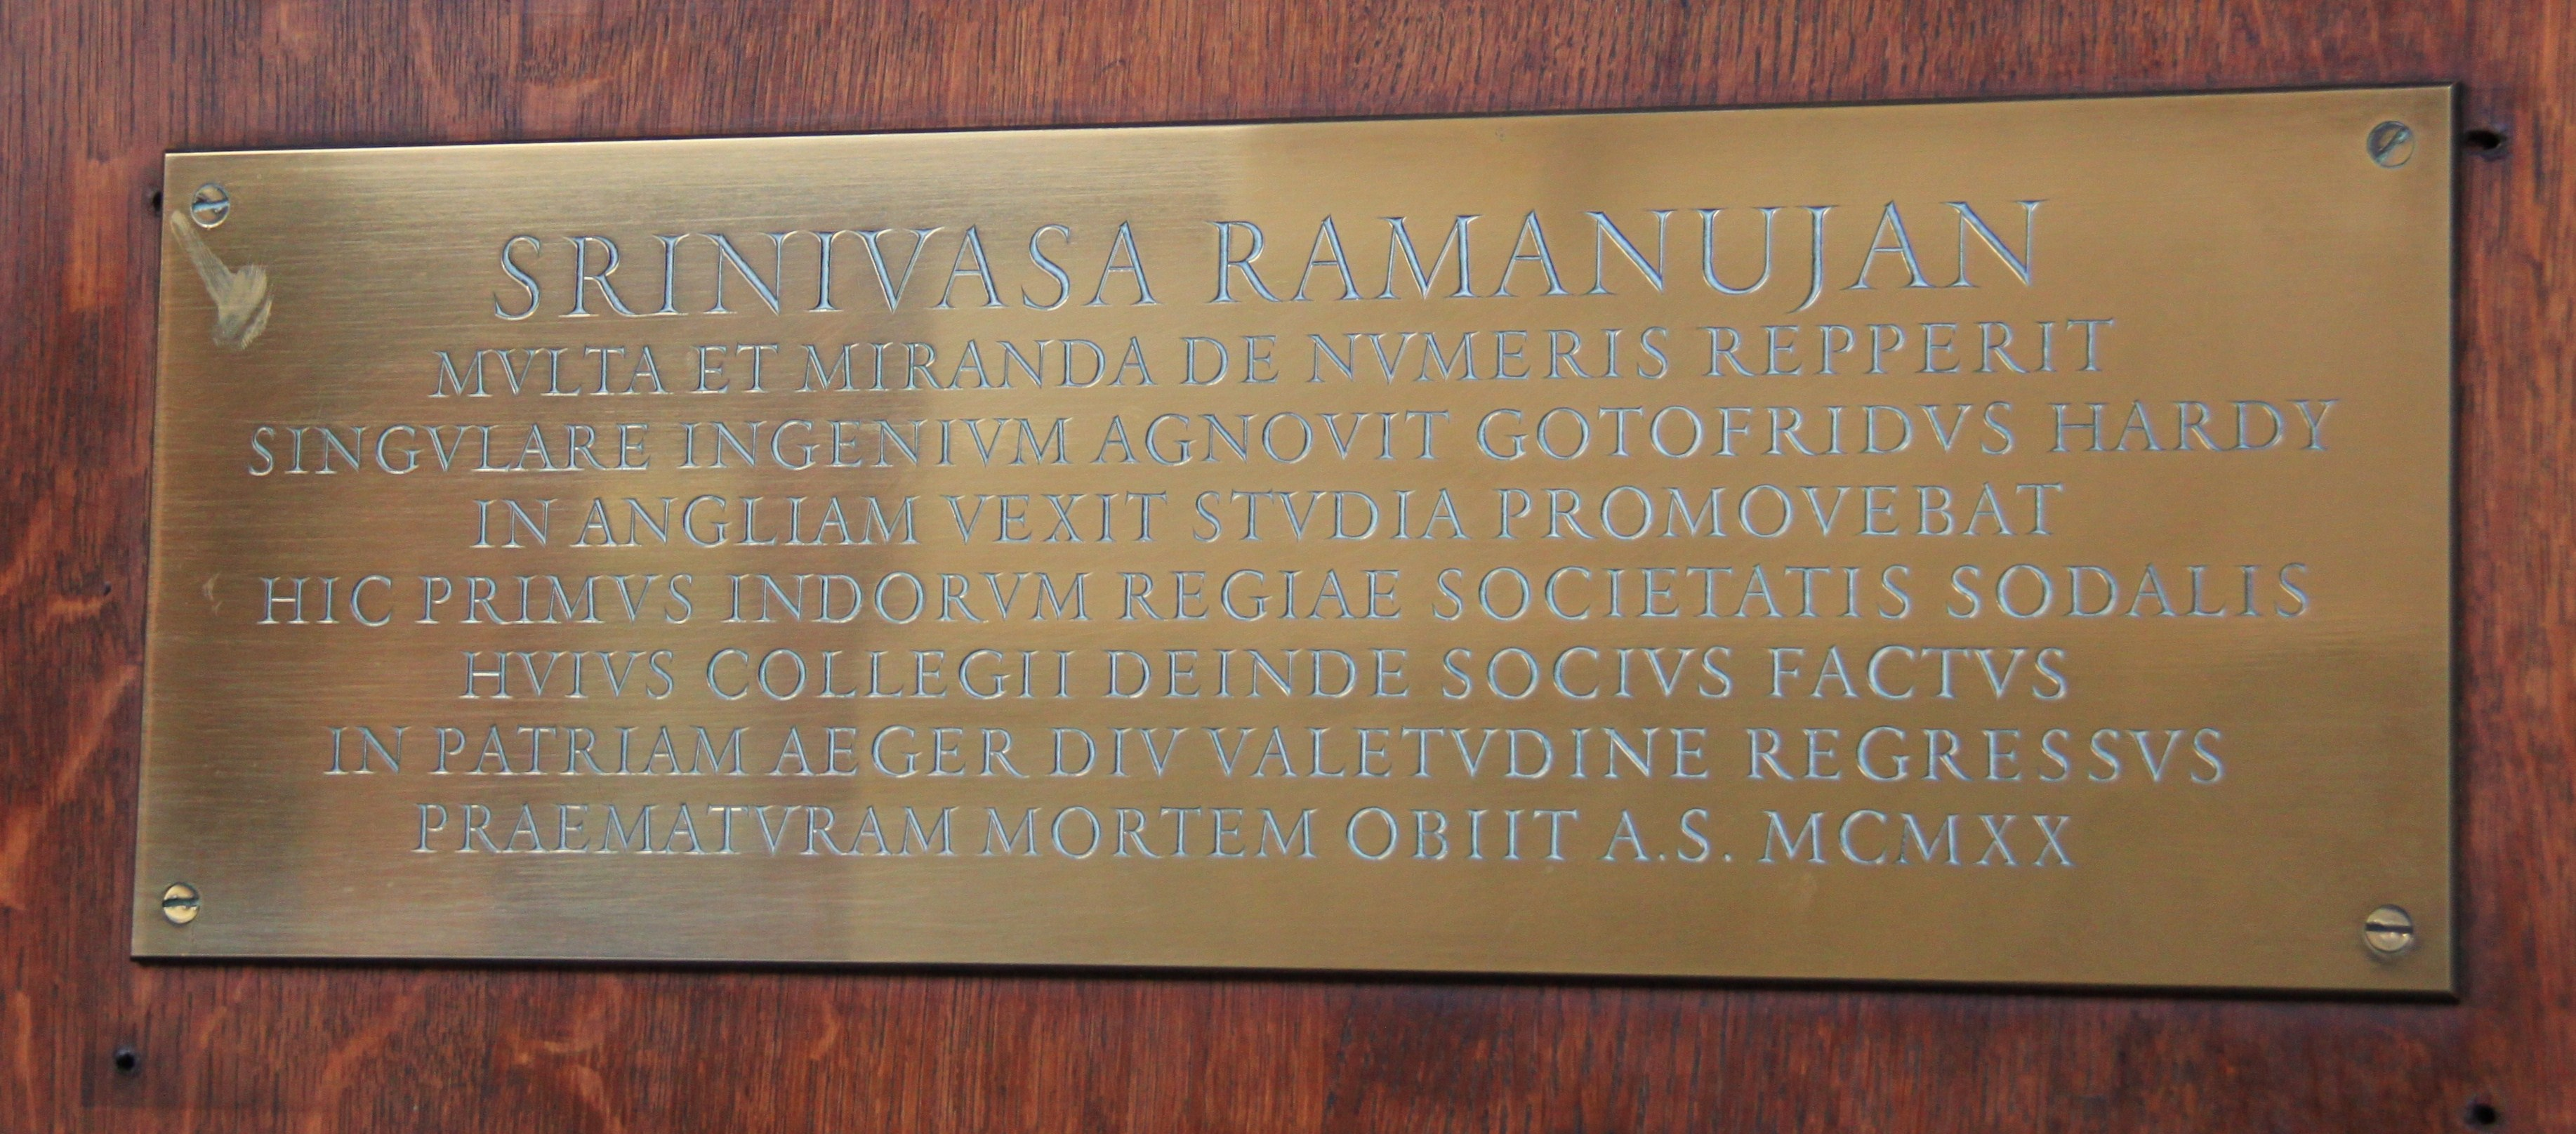 NOTEBOOKS OF SRINIVASA RAMANUJAN EBOOK DOWNLOAD